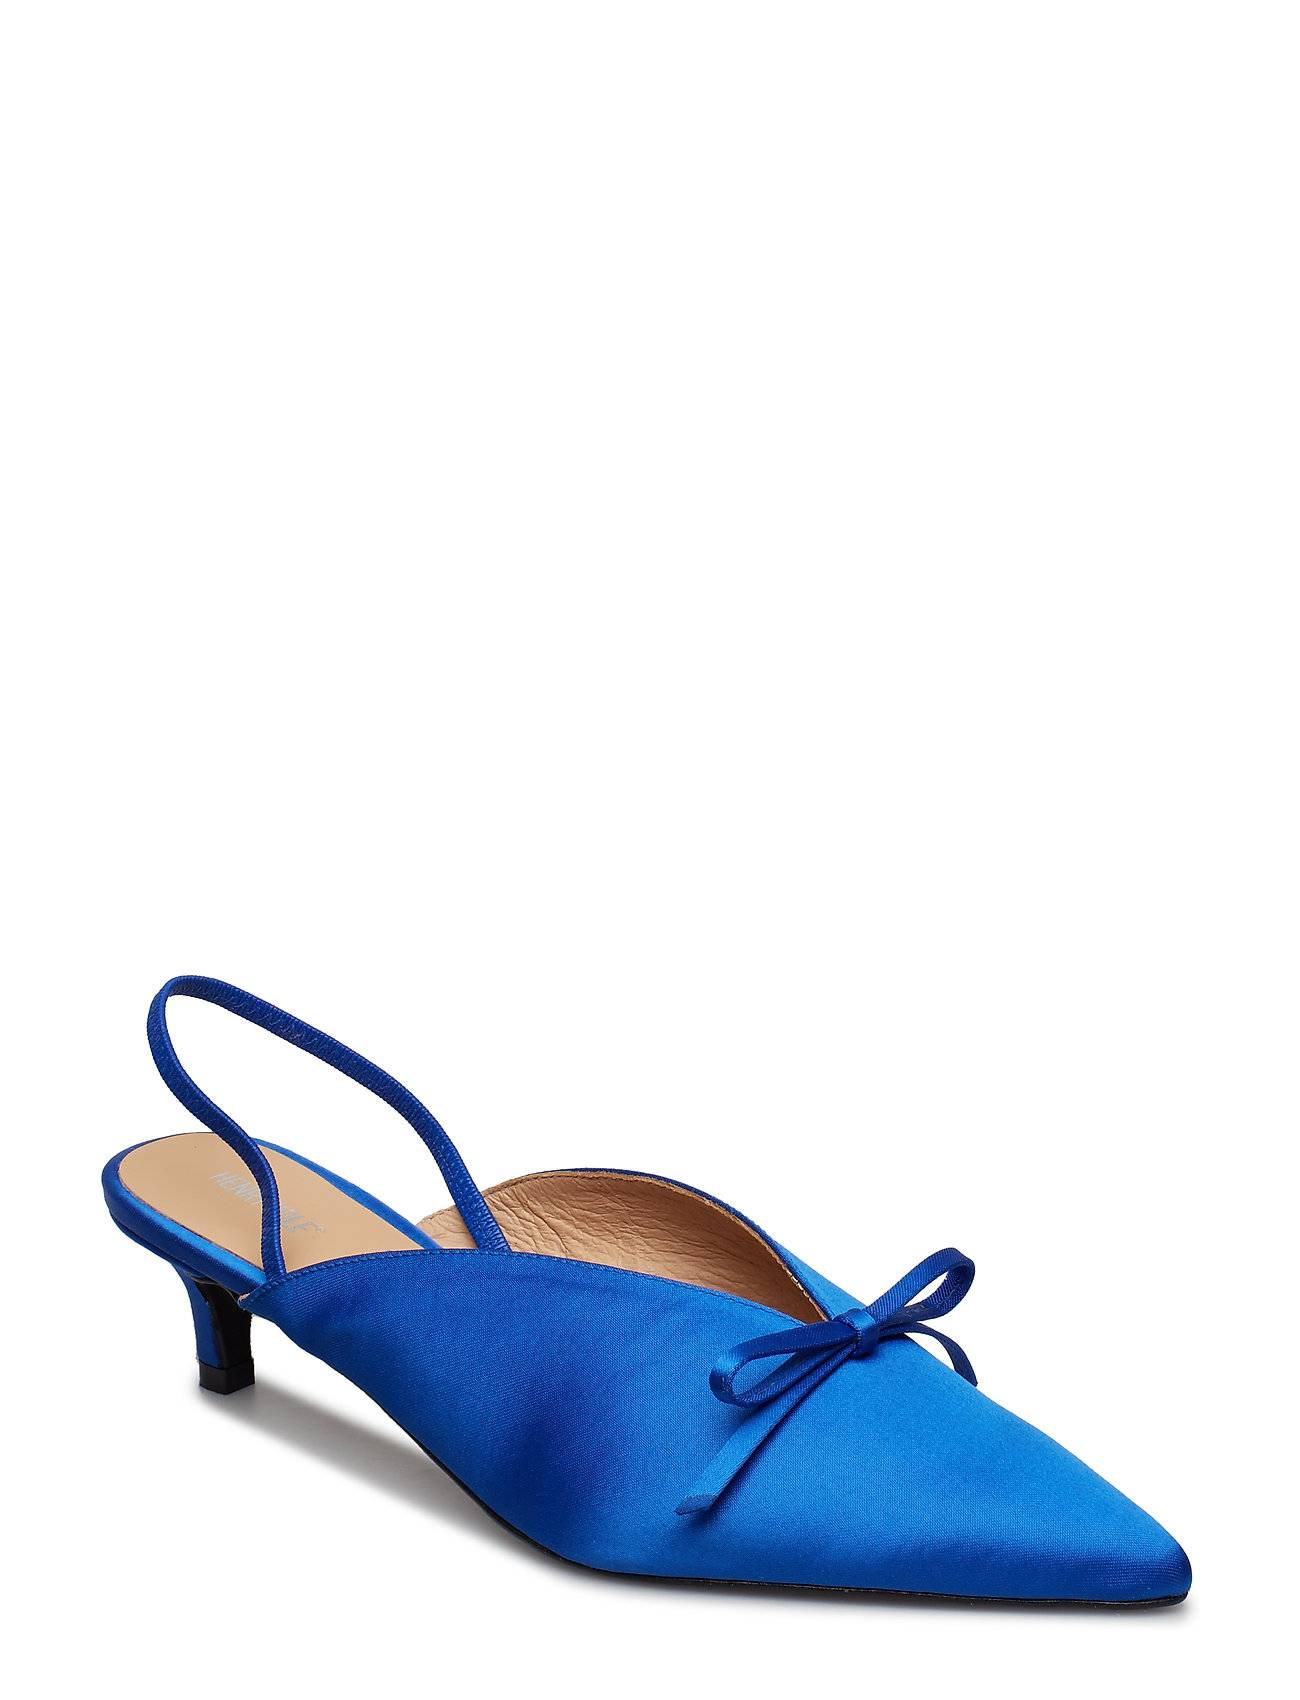 Henry Kole Amelie Satin Blue Shoes Heels Pumps Sling Backs Sininen Henry Kole